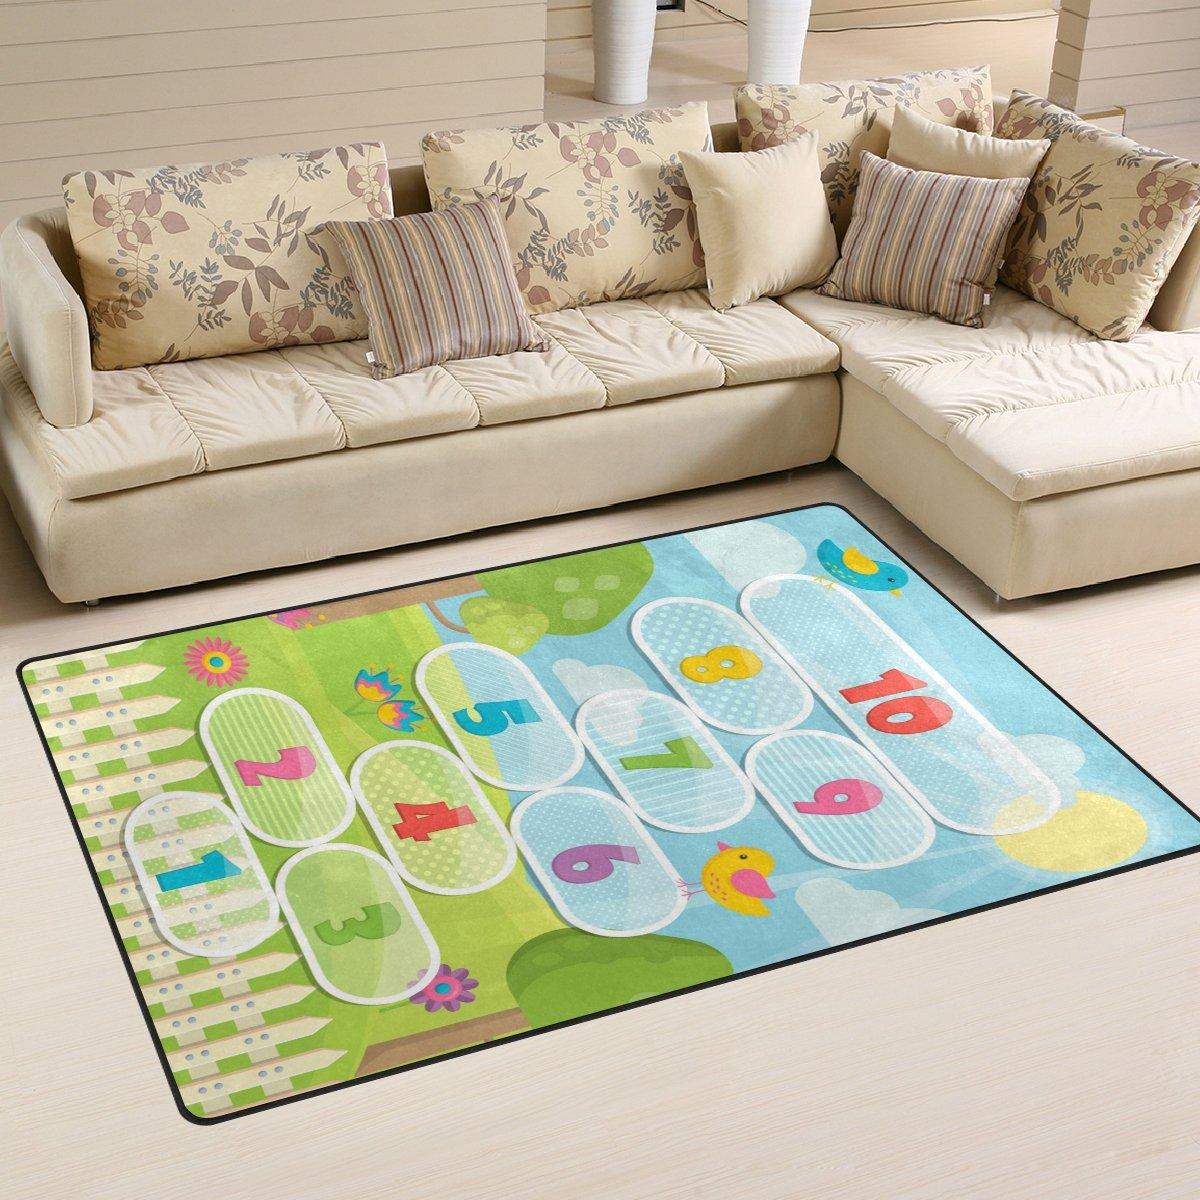 WellLee Area Rug,Sunny Meadow Hopscotch Game Floor Rug Non-slip Doormat for Living Dining Dorm Room Bedroom Decor 60x39 Inch